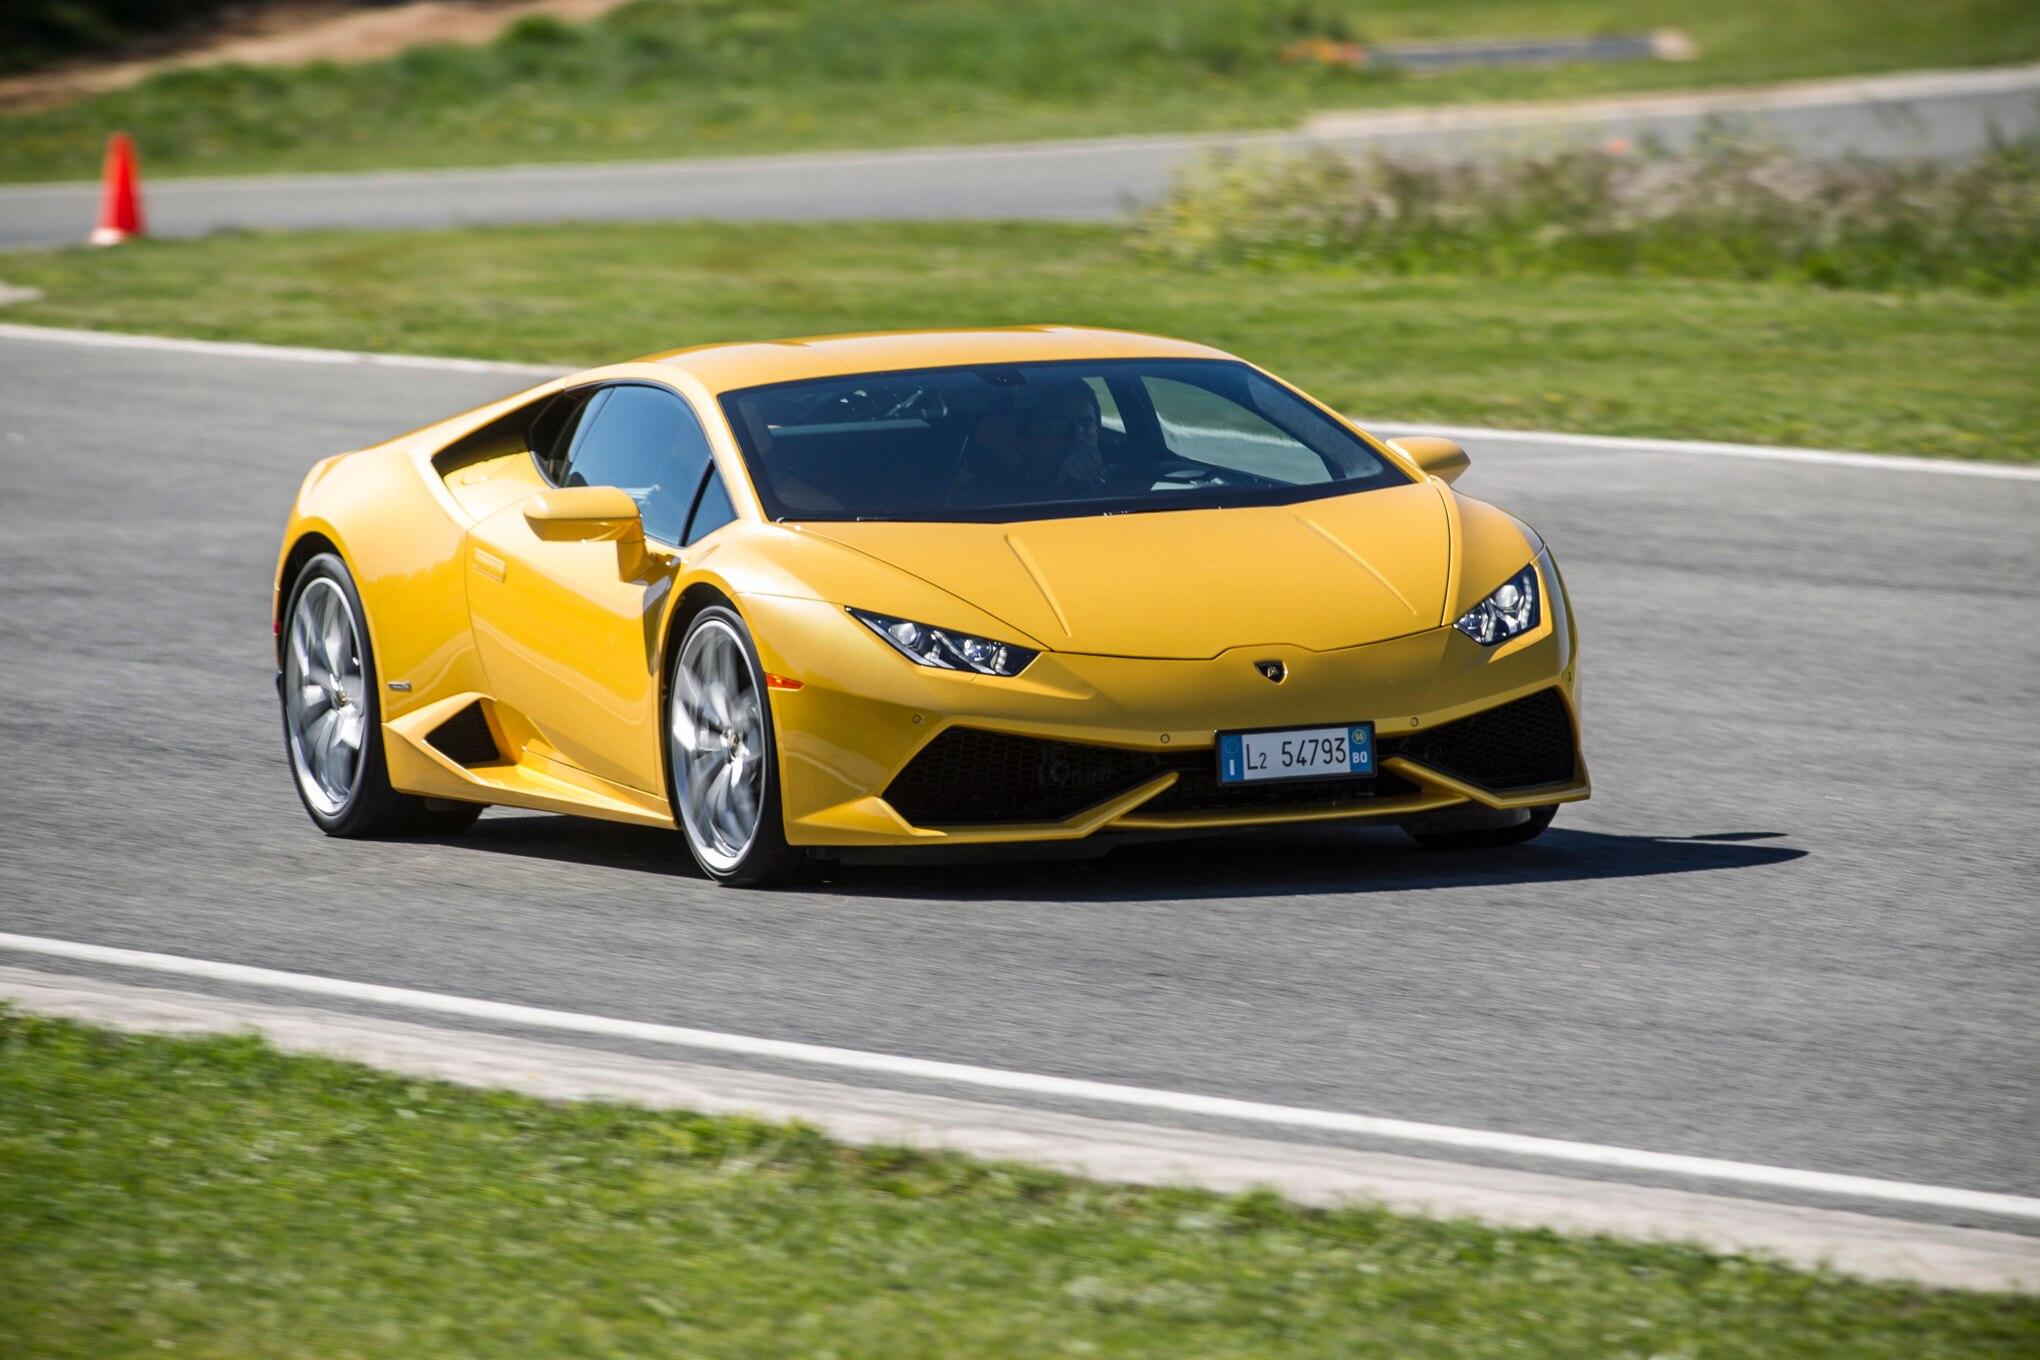 2015 Lamborghini Huracan LP 610 4 Track Yellow Front Three Quarter In Motion